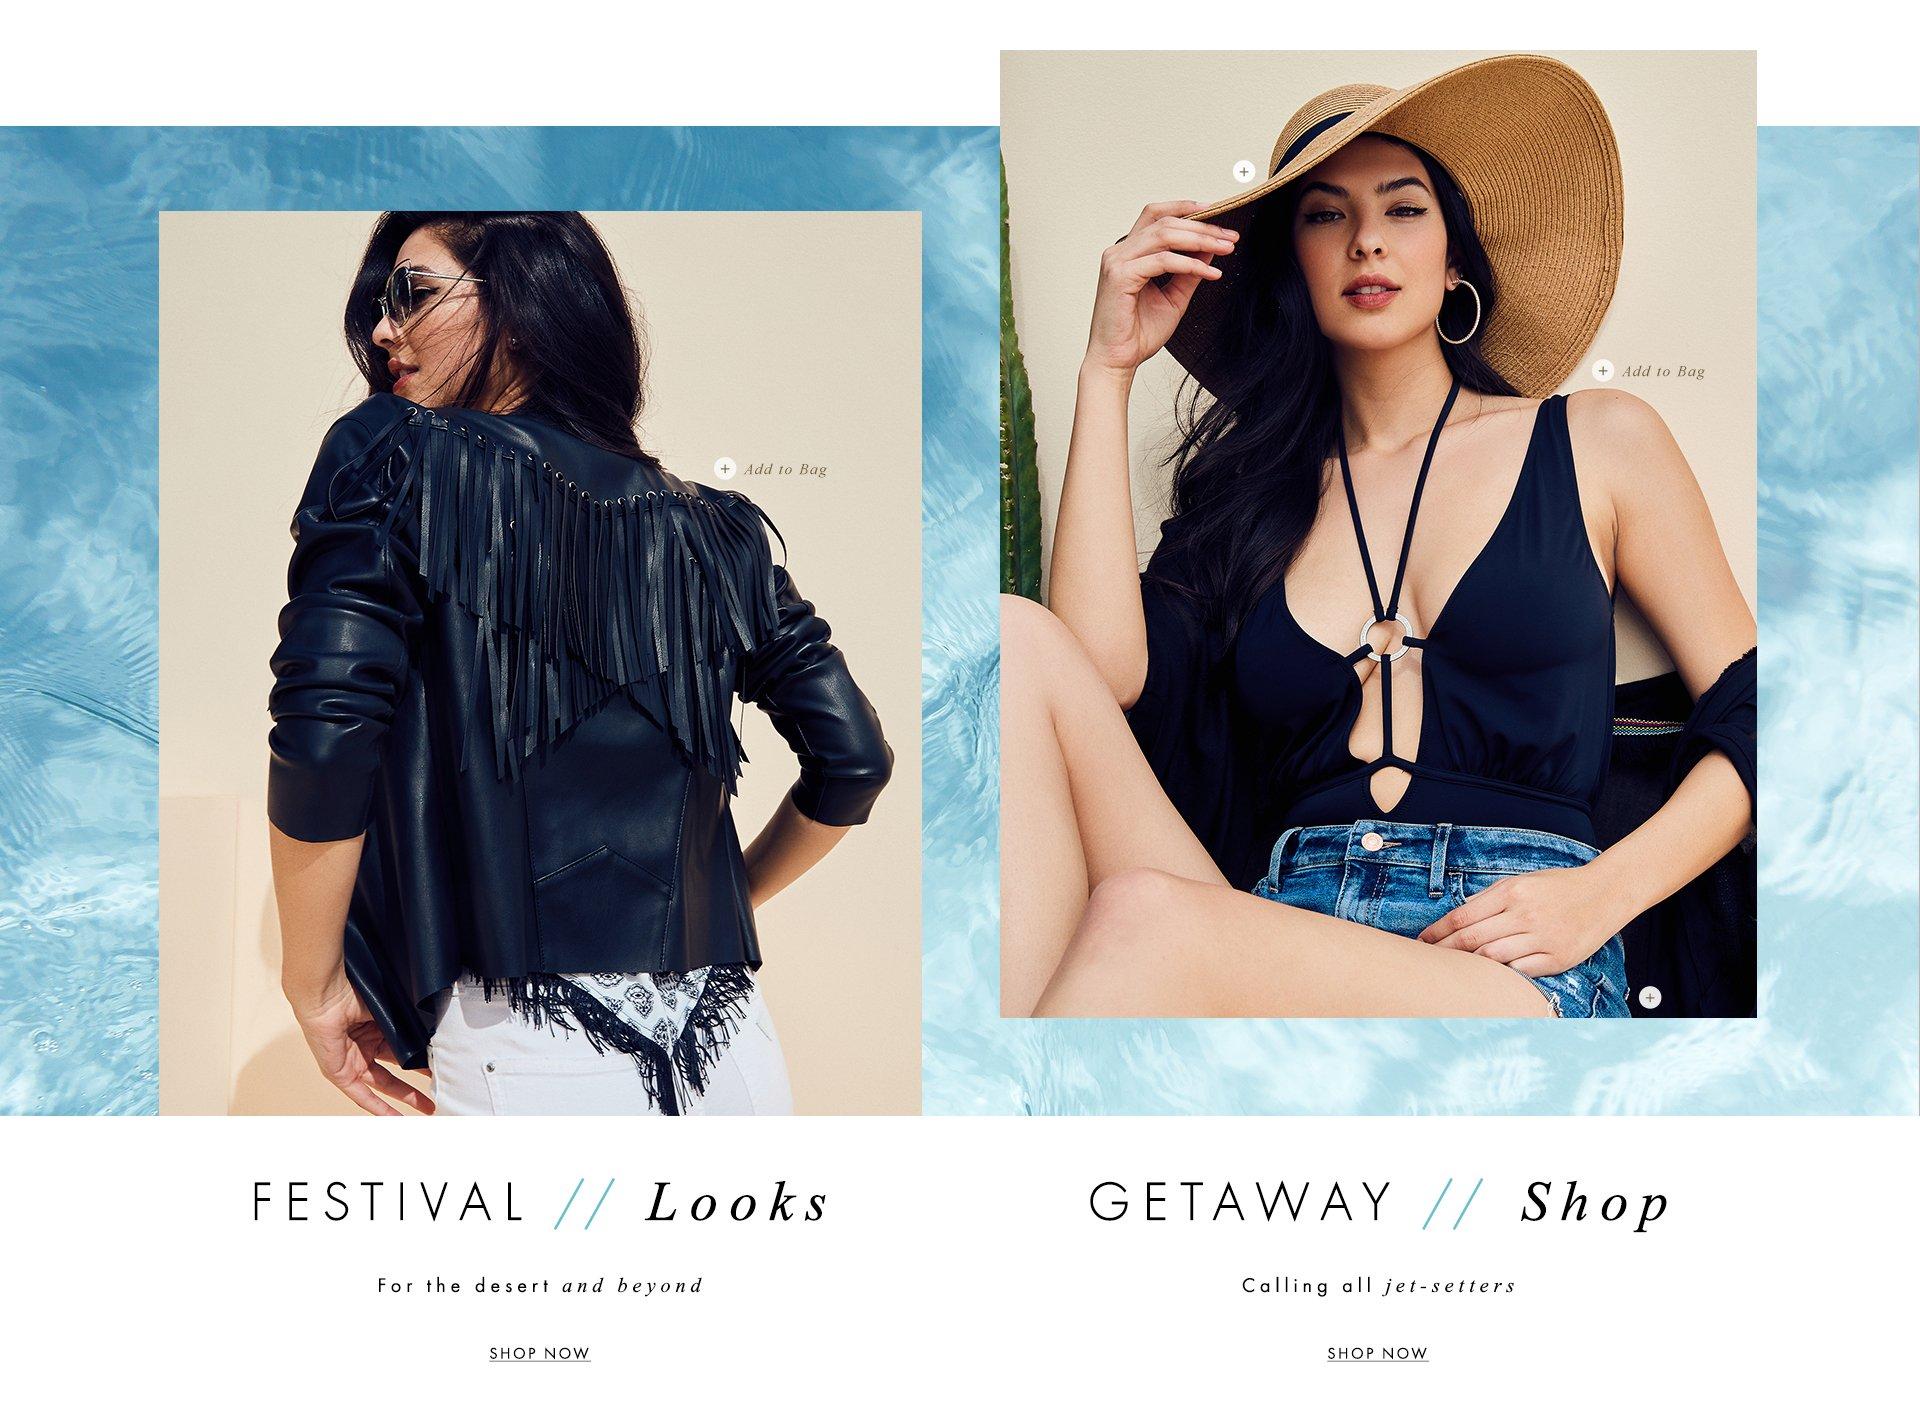 Festival Looks Getaway Shop